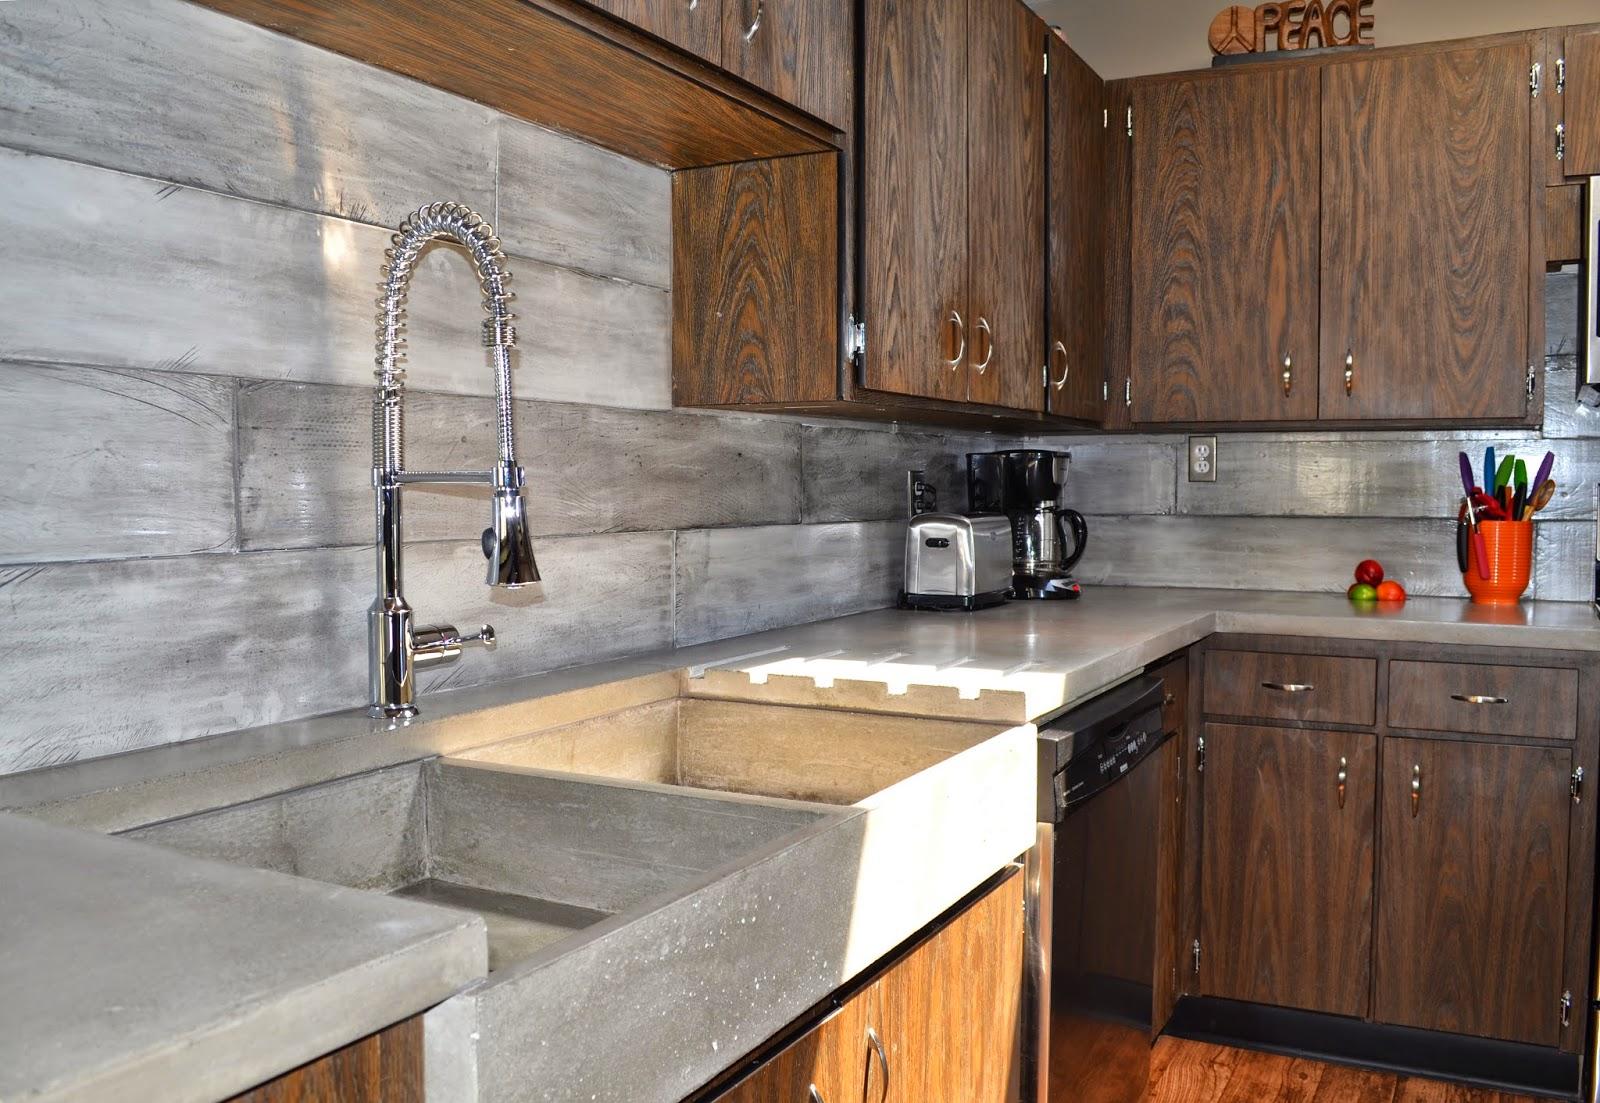 MODE CONCRETE: Modern Contemporary Concrete Kitchen with ...